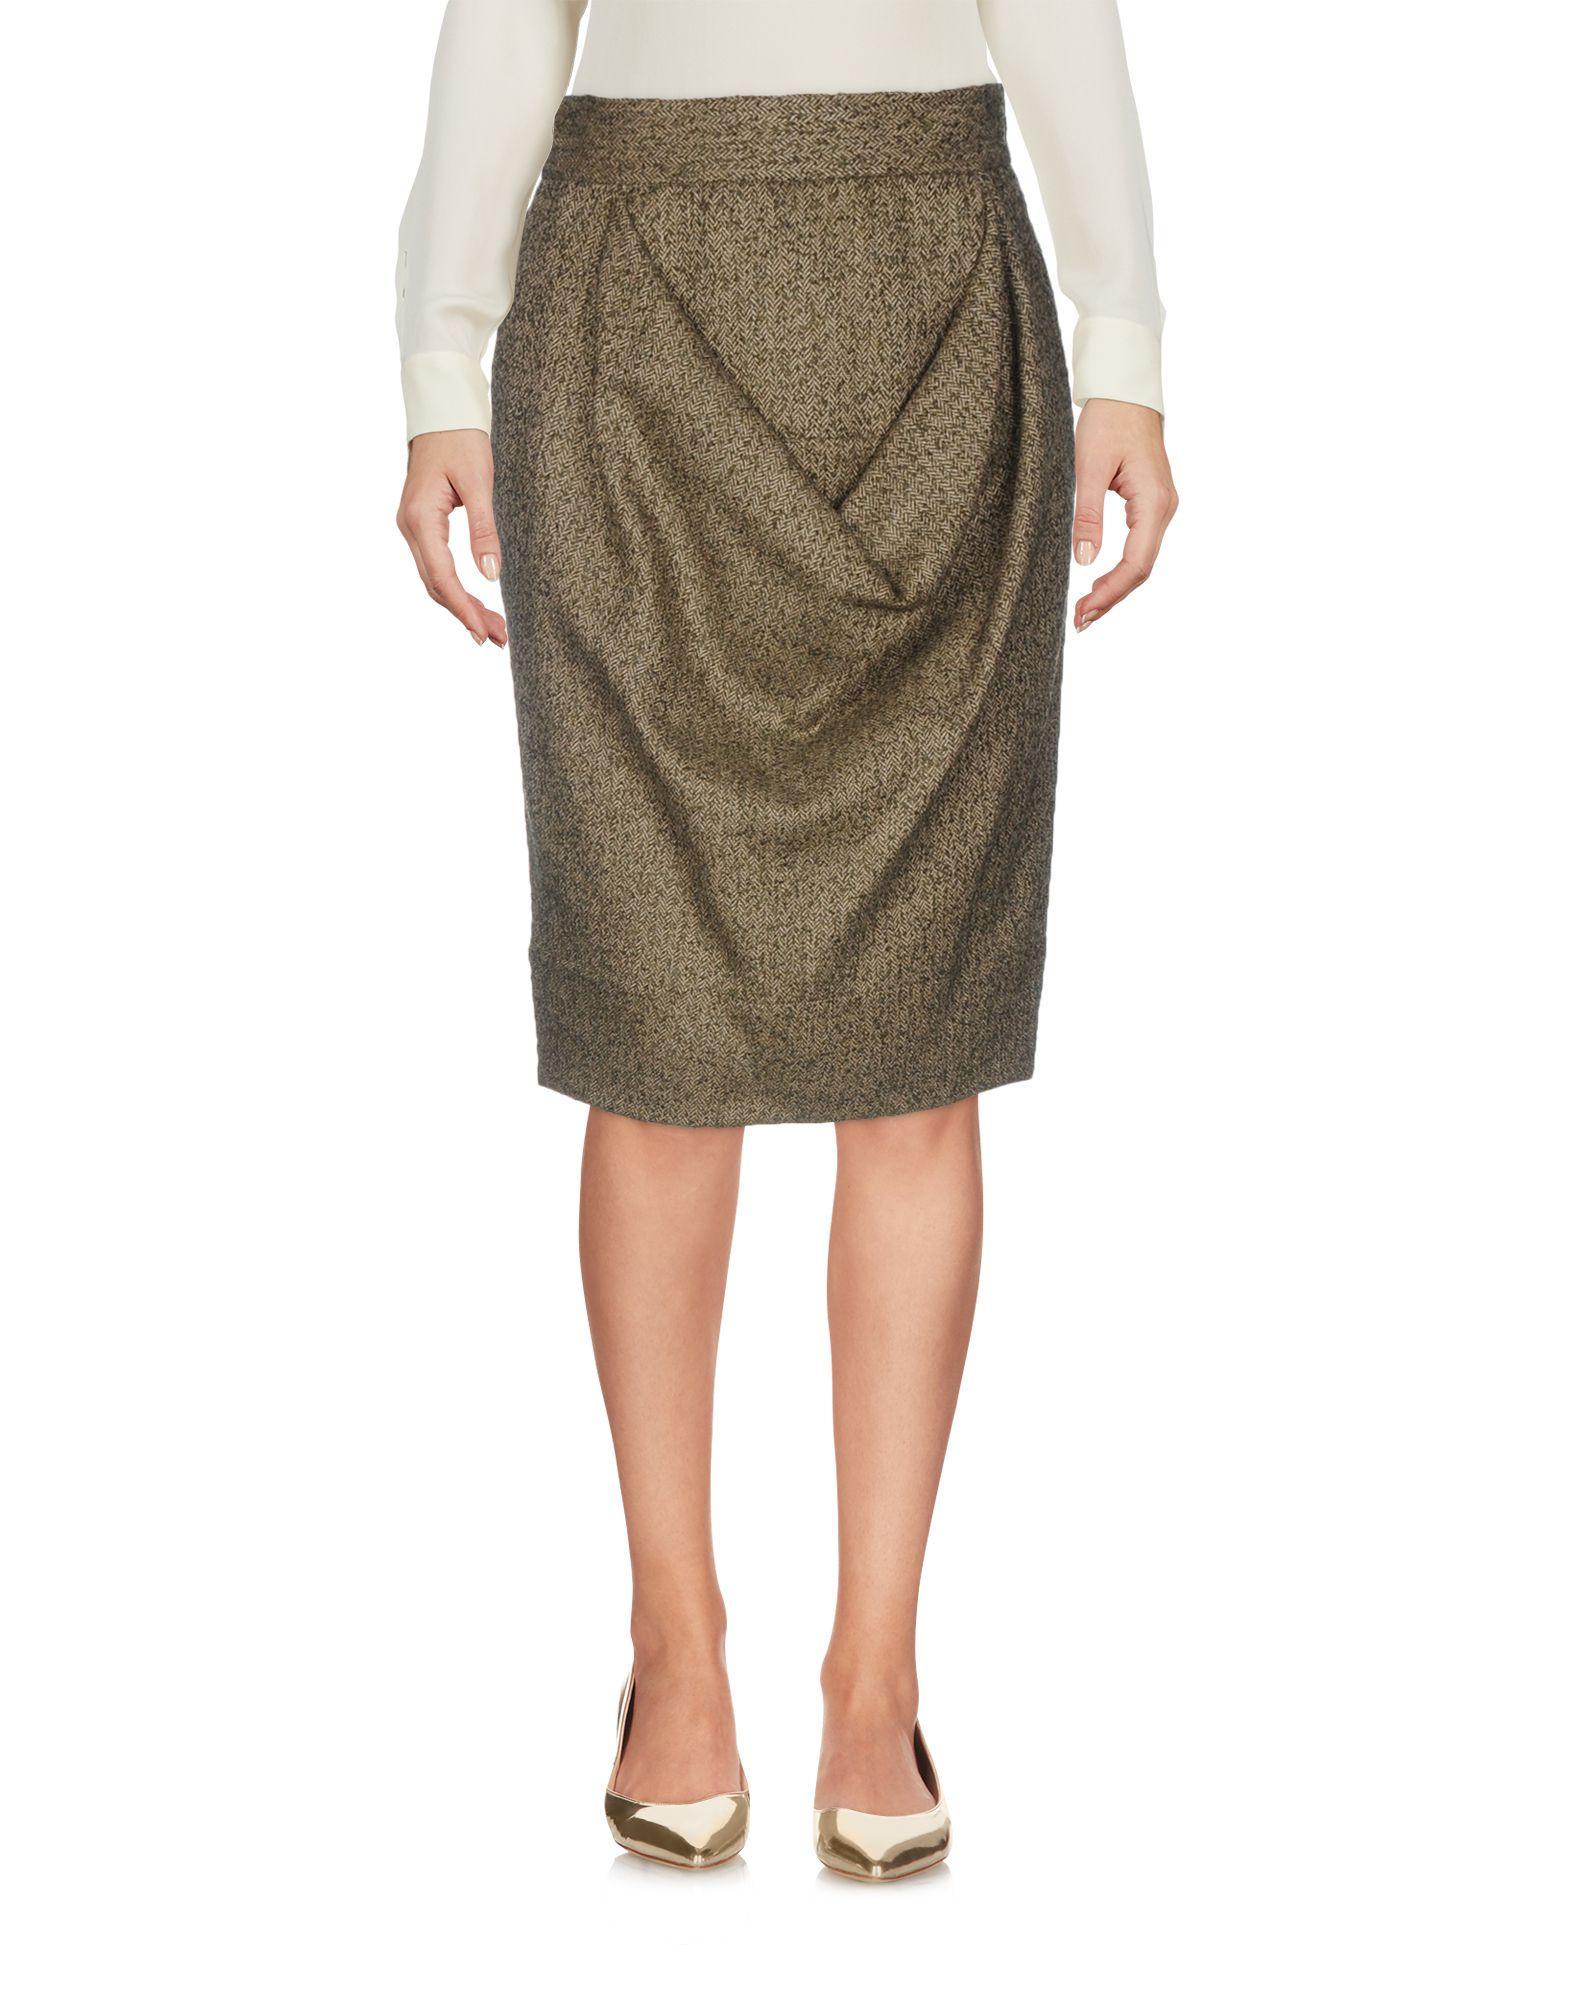 fef8c8b2ac Vivienne Westwood Red Label Knee Length Skirt In Khaki | ModeSens